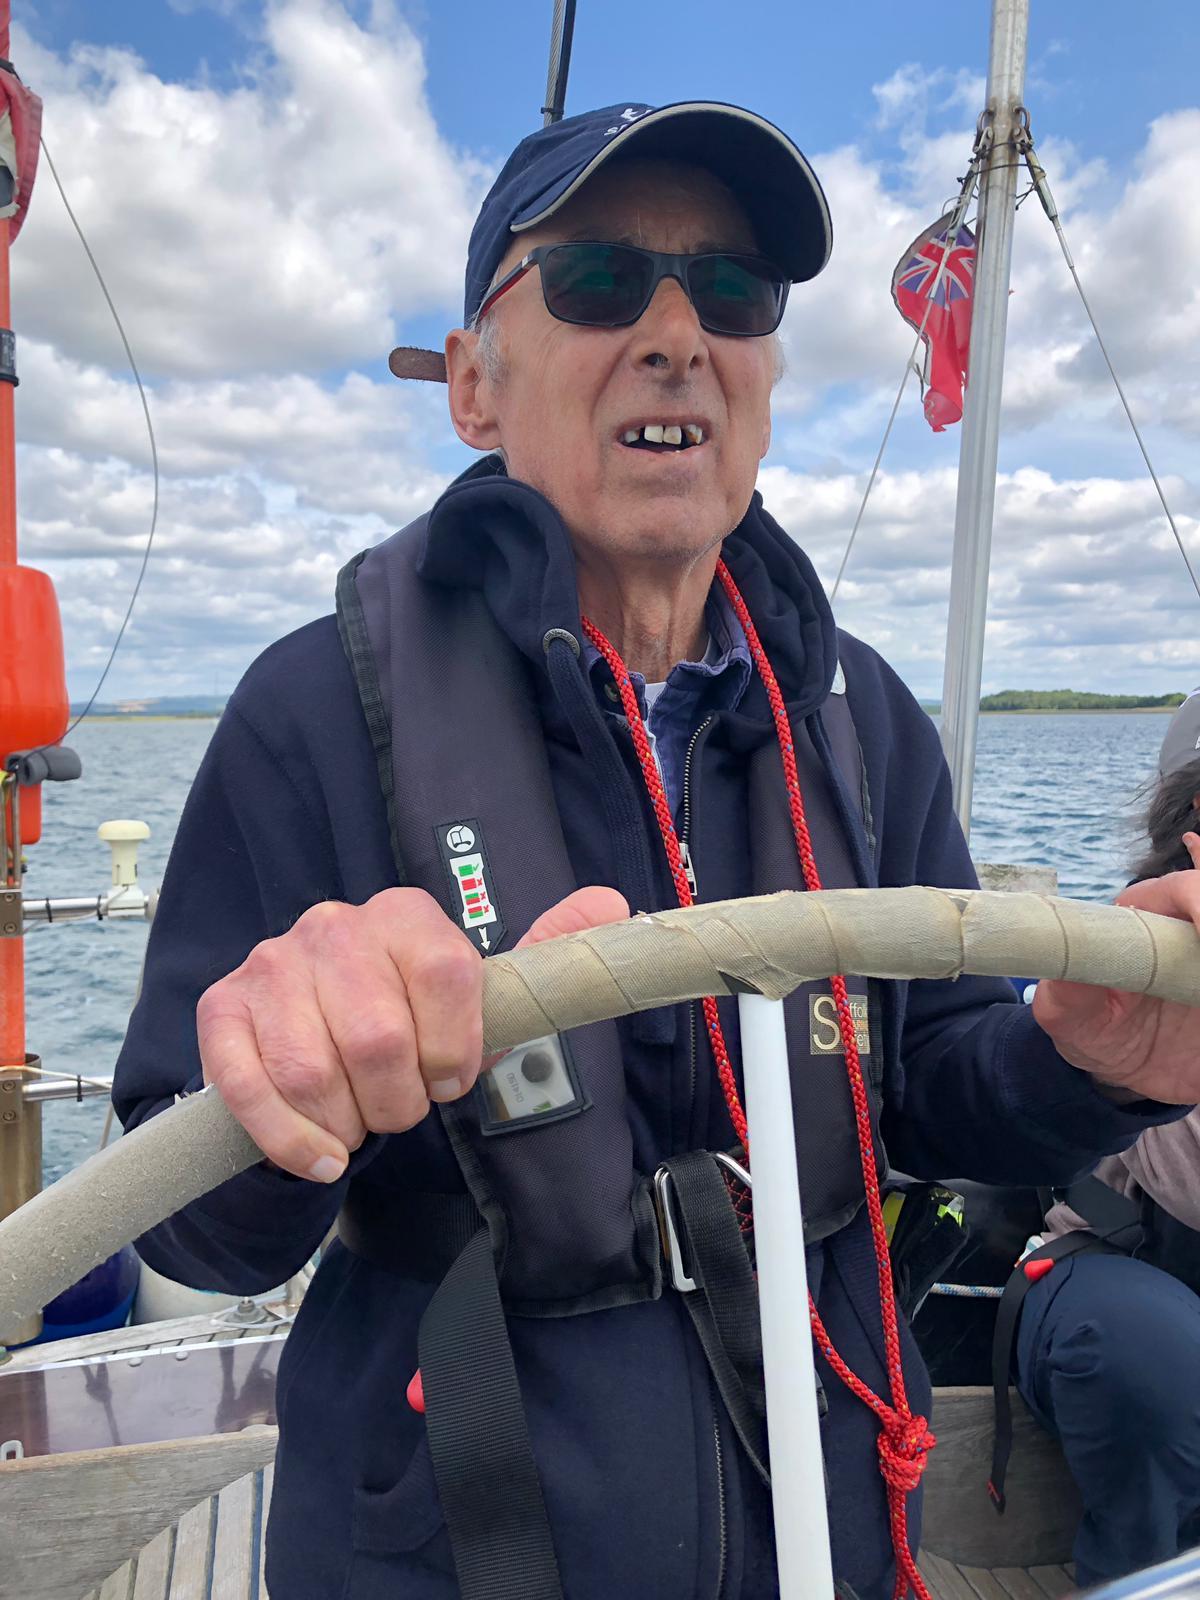 'Dementia sail' in Chichester harbour